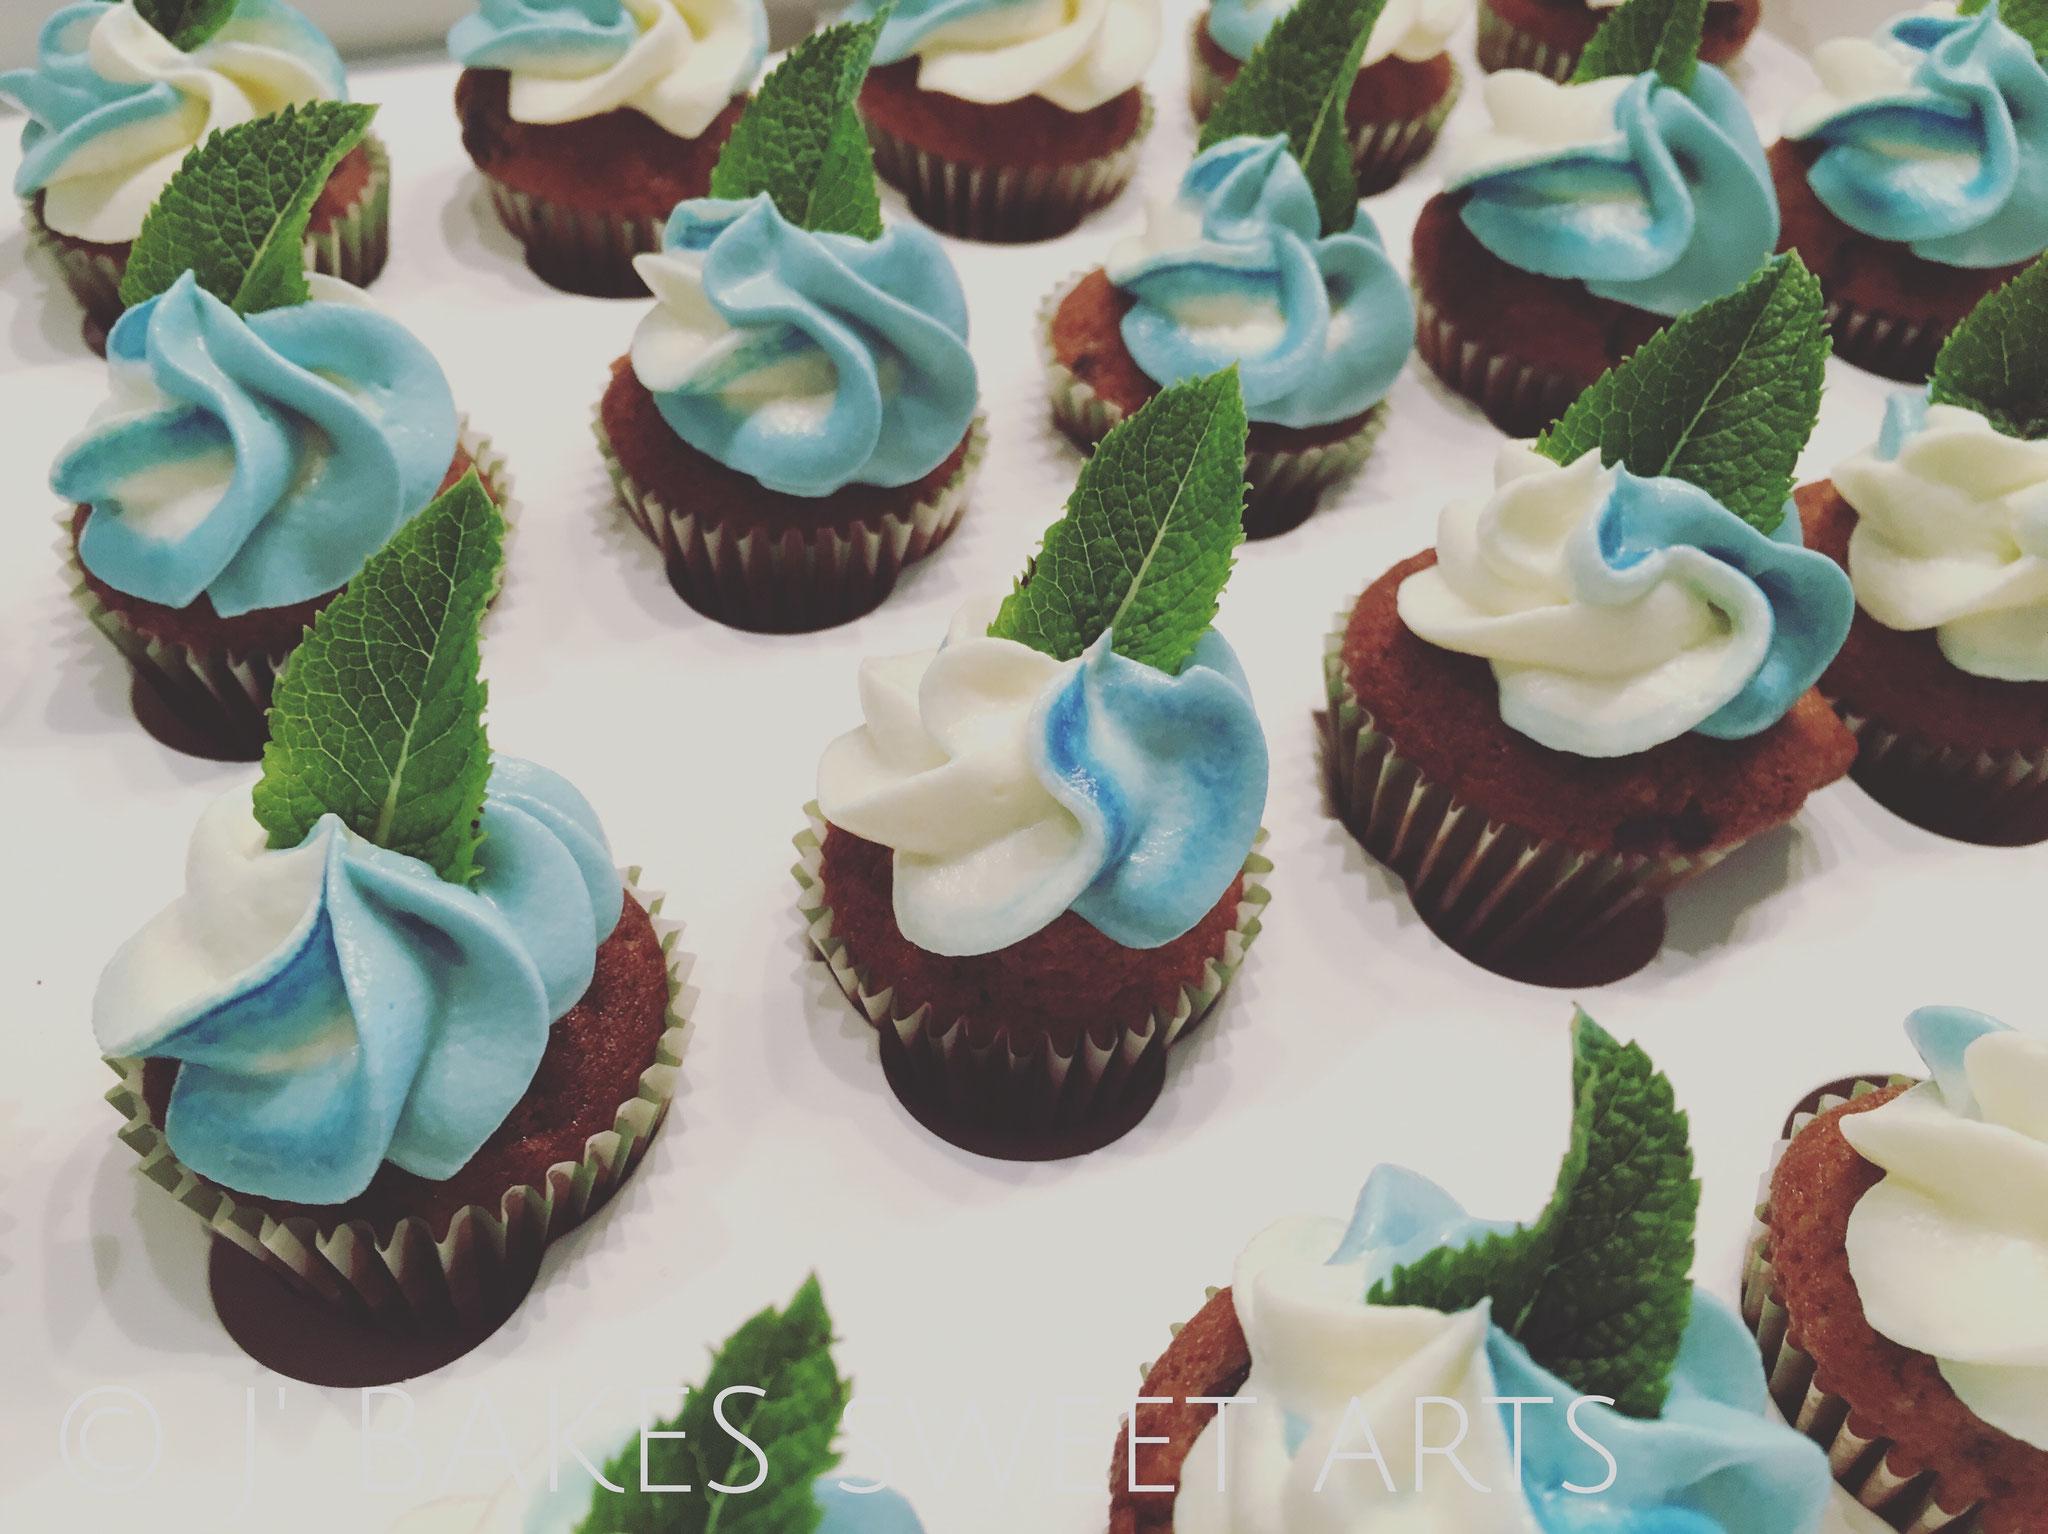 Blaubeer-Mini-Cupcake // Blueberry-mini-cupcake